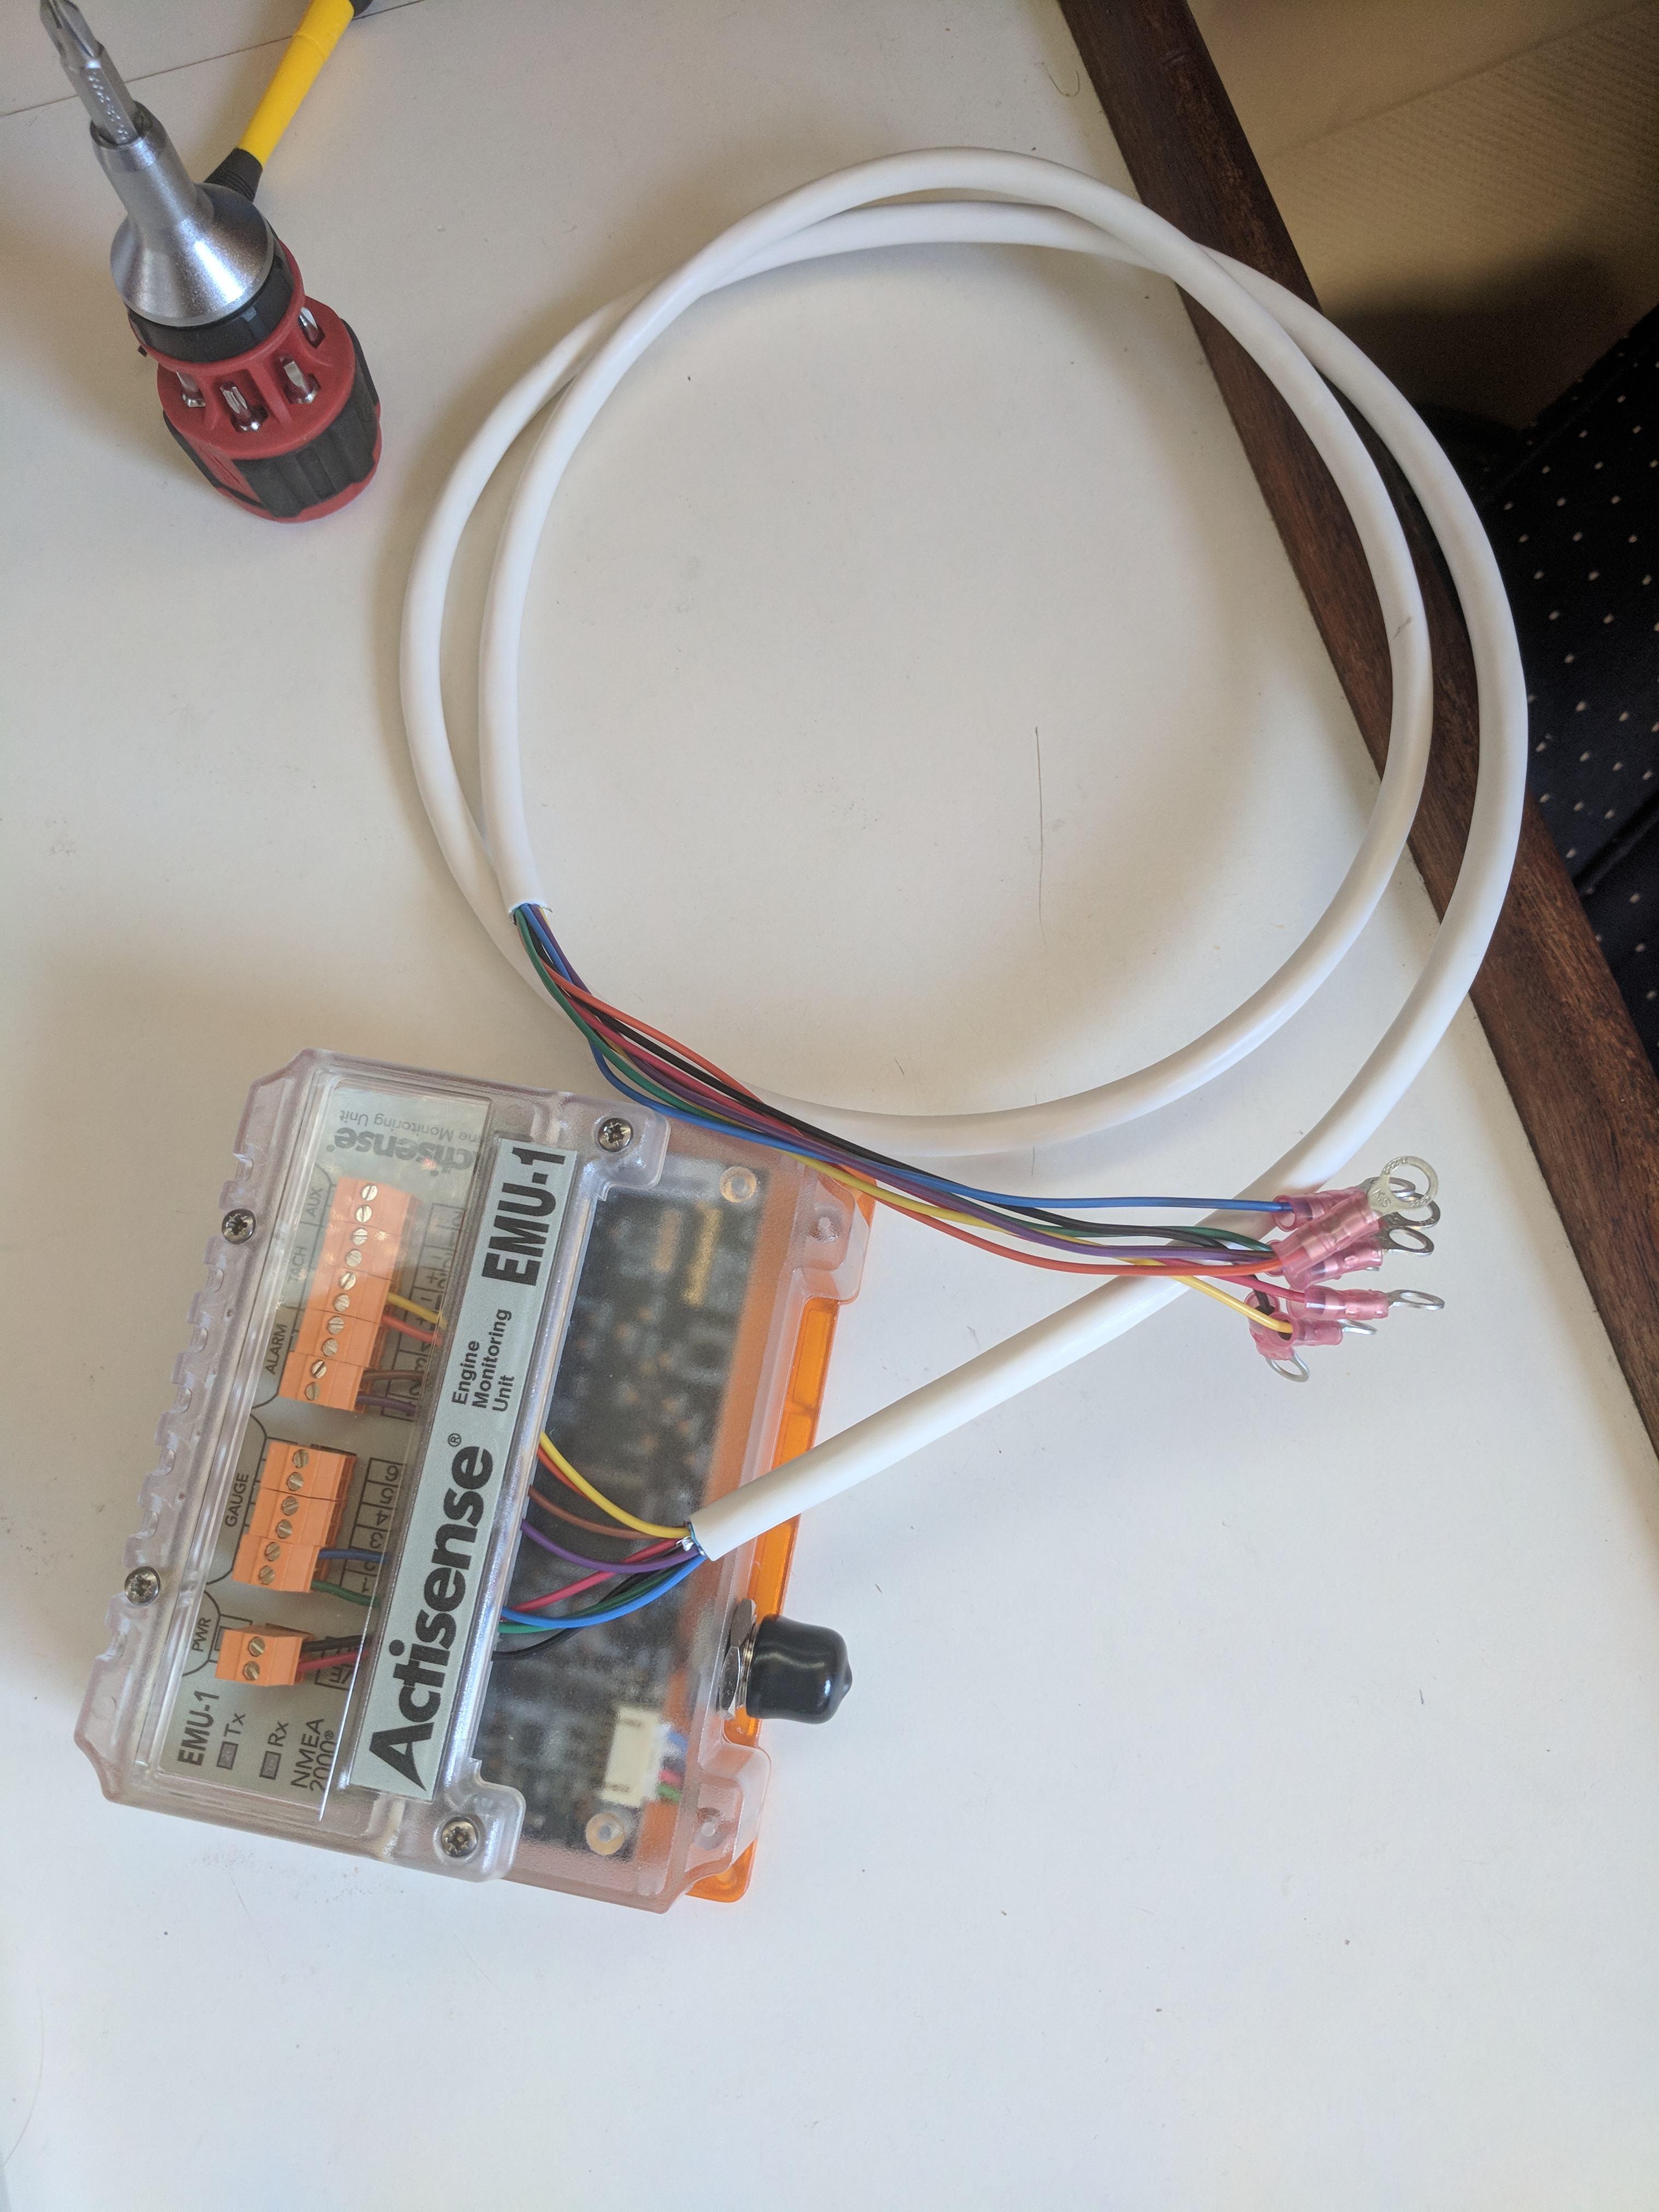 Universal M25XPB Engine Monitoring Actisense EMU-1 setup